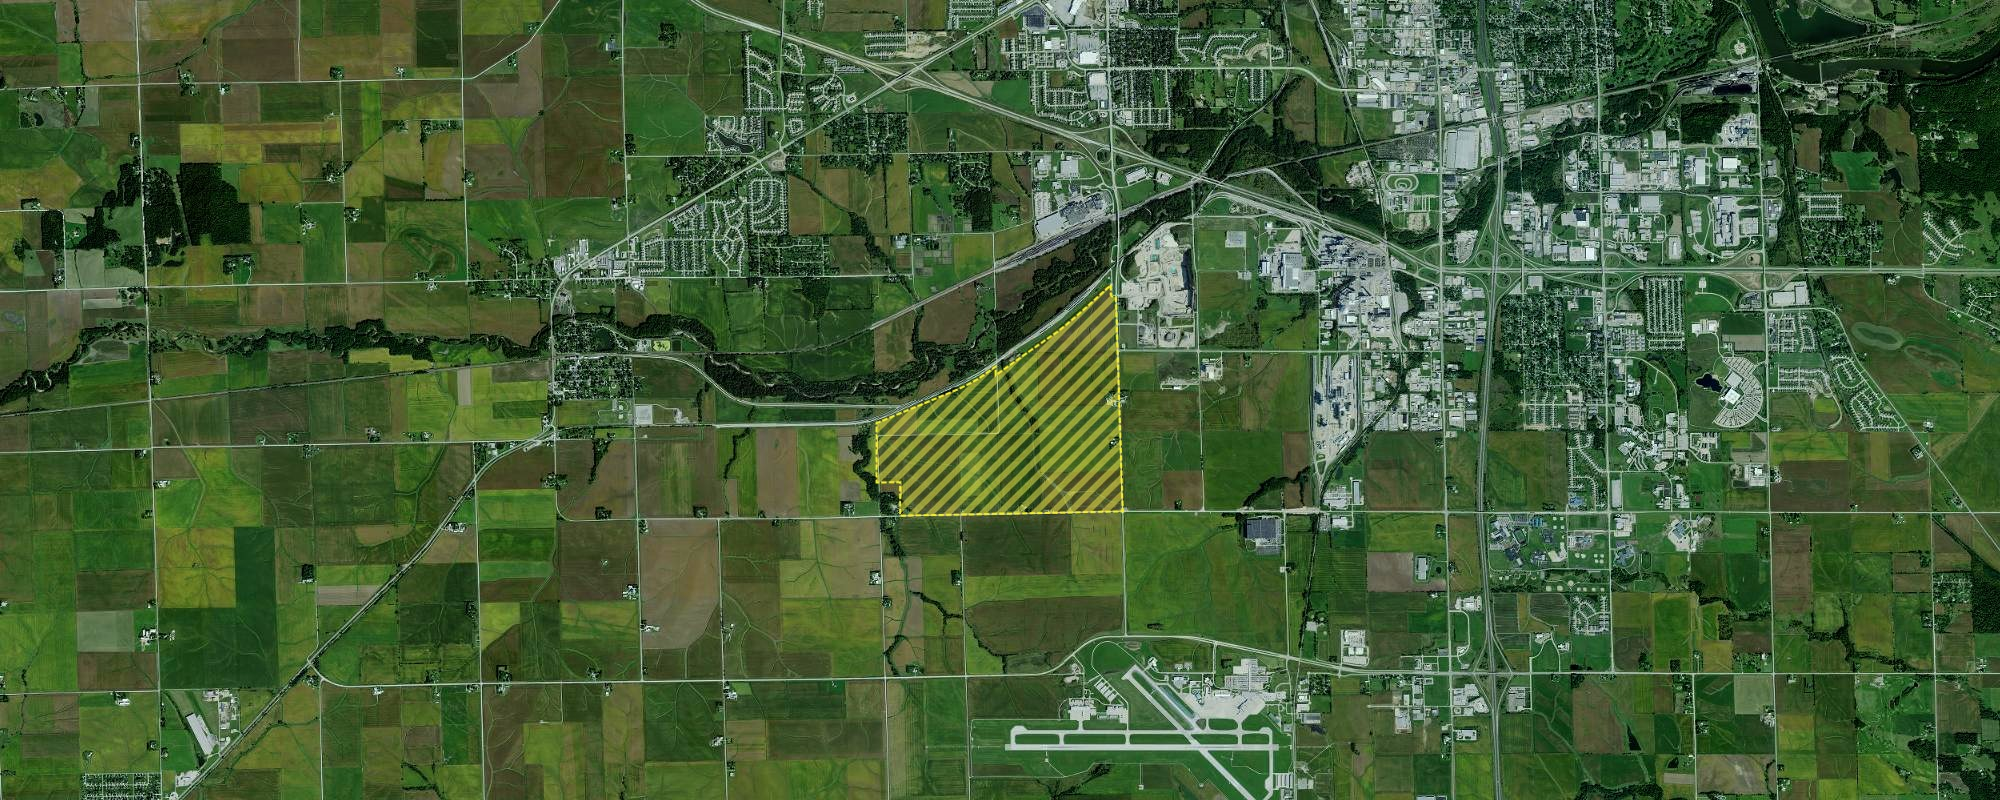 Cedar Rapids Big Cedar Industrial Center Certified Site - Iowa ... on map of windsor heights iowa, map of ft dodge iowa, map of coggon iowa, map of lemars iowa, map of panora iowa, map of boxholm iowa, map of sergeant bluff iowa, map of strawberry point iowa, map of garnavillo iowa, map of monona iowa, map of dike iowa, map of elk horn iowa, map of correctionville iowa, map of clutier iowa, map of drakesville iowa, map of keota iowa, map of larchwood iowa, map of lincoln iowa, map of letts iowa, map of tripoli iowa,